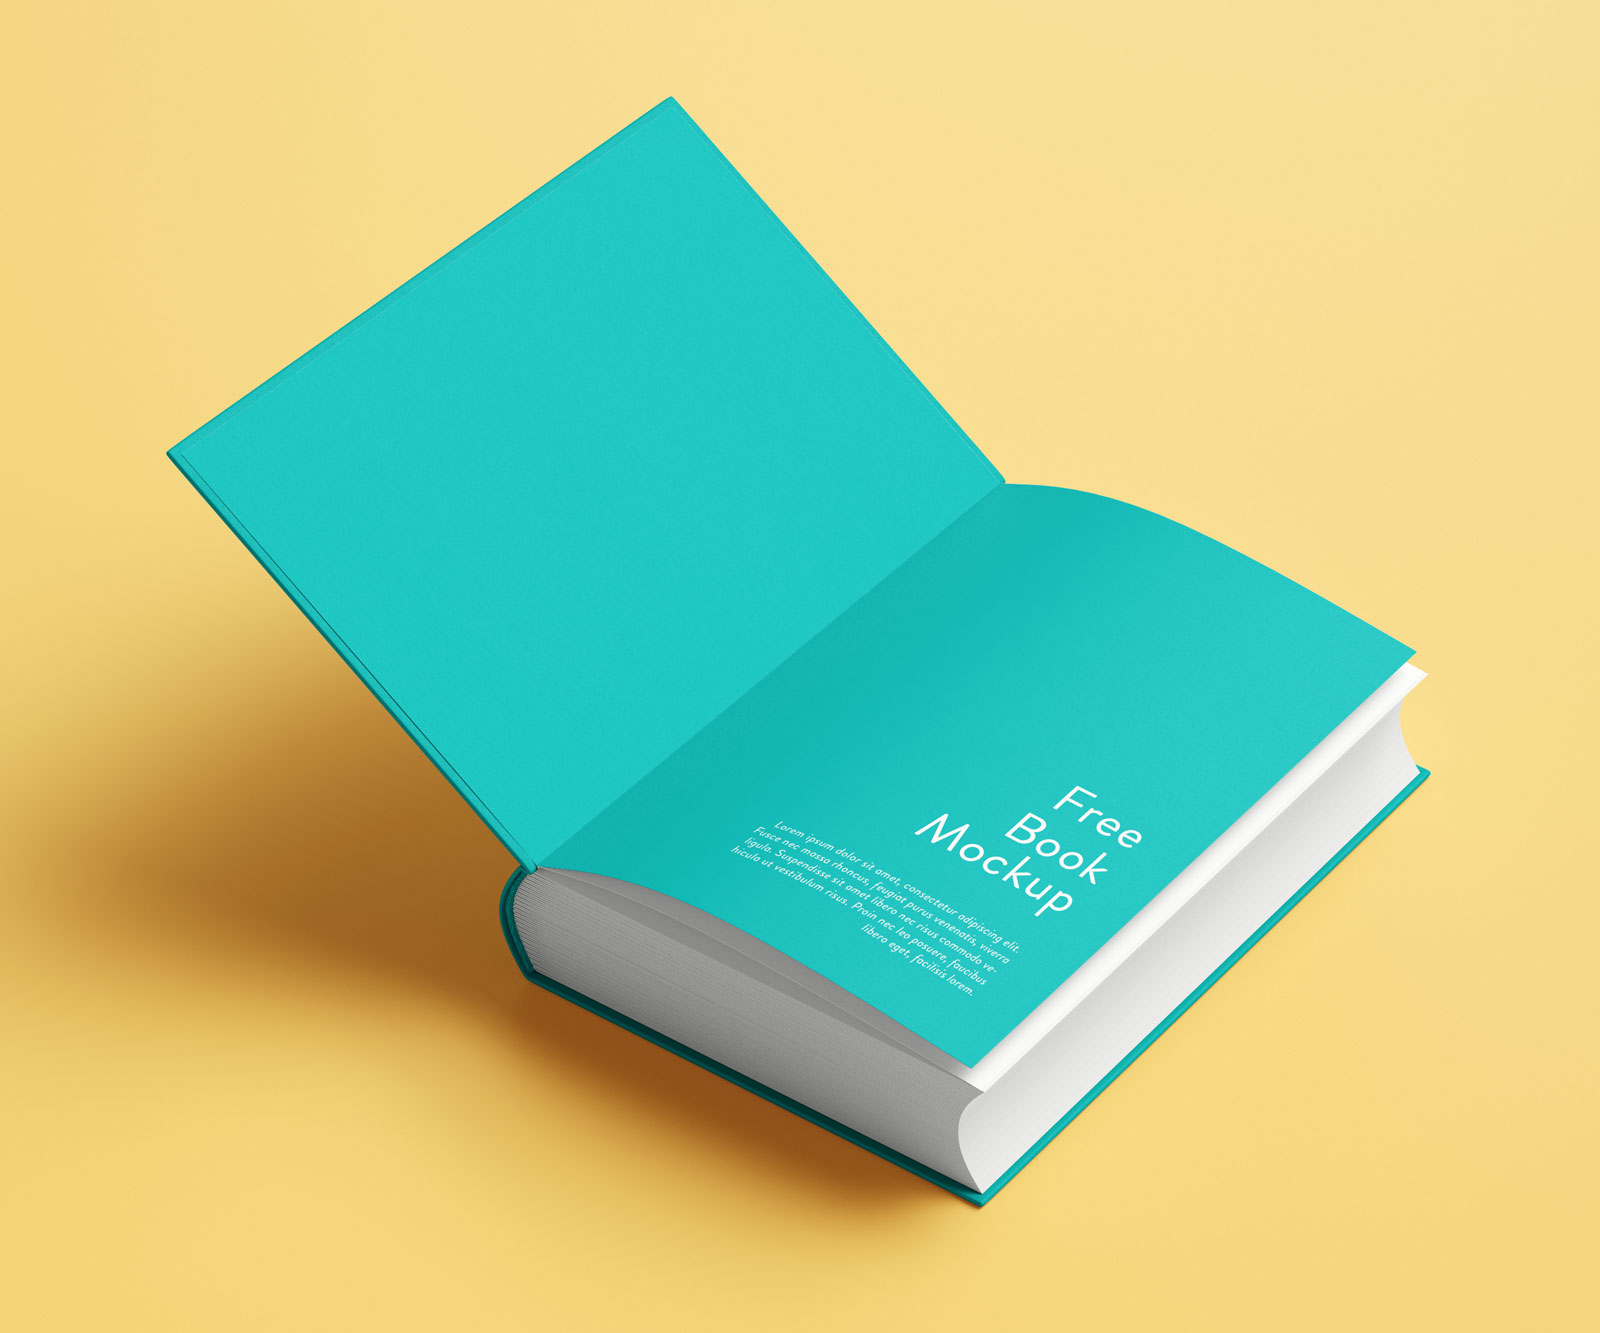 Free-Premium-Thick-Book-Mockup-PSD-8